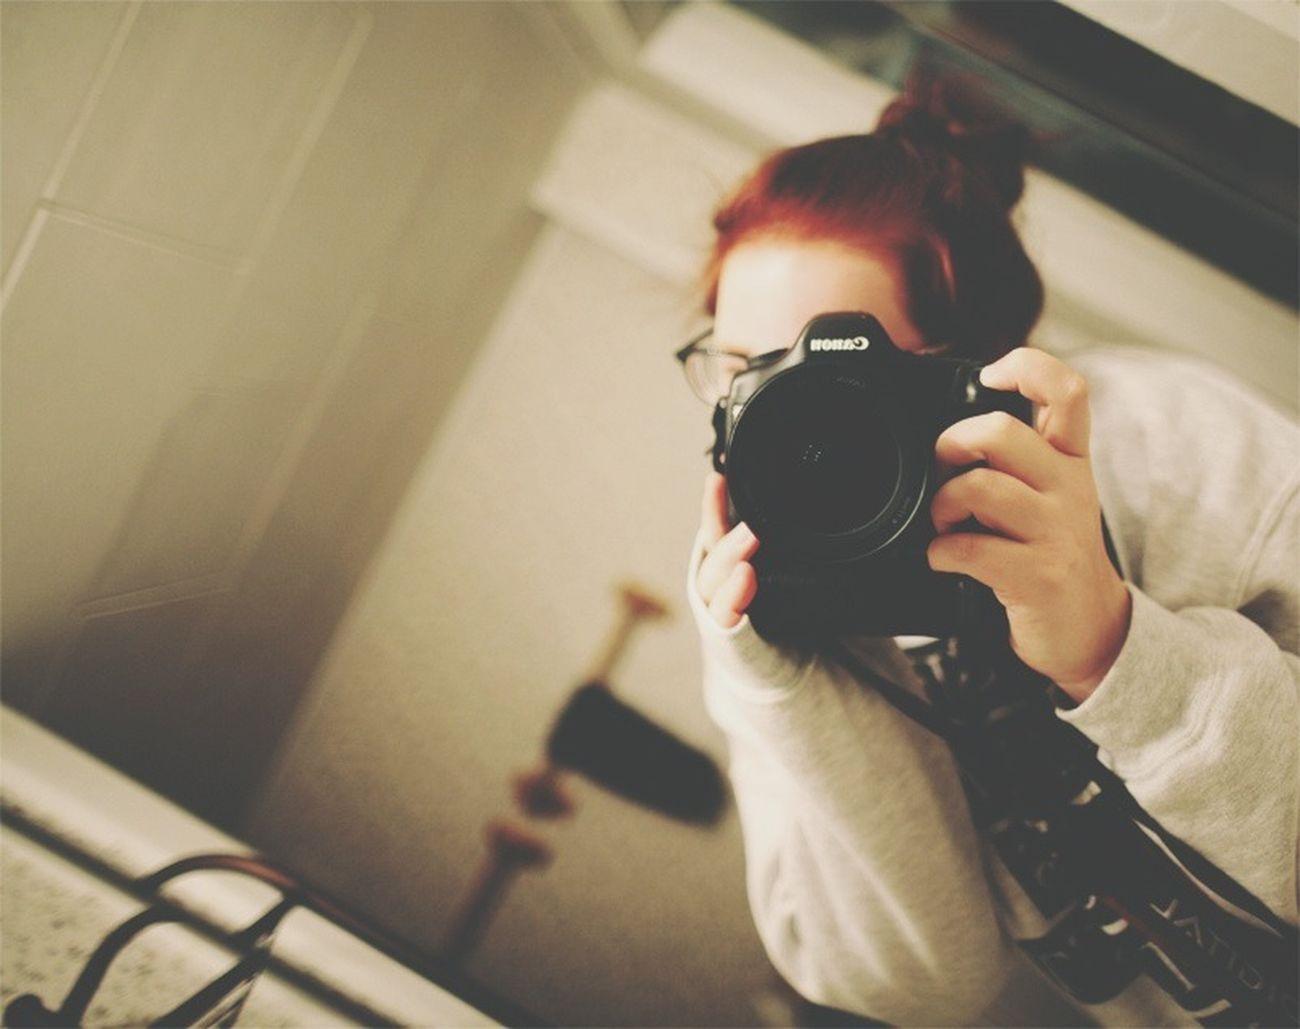 Selfie Ginger Redhead The Portraitist - 2014 EyeEm Awards